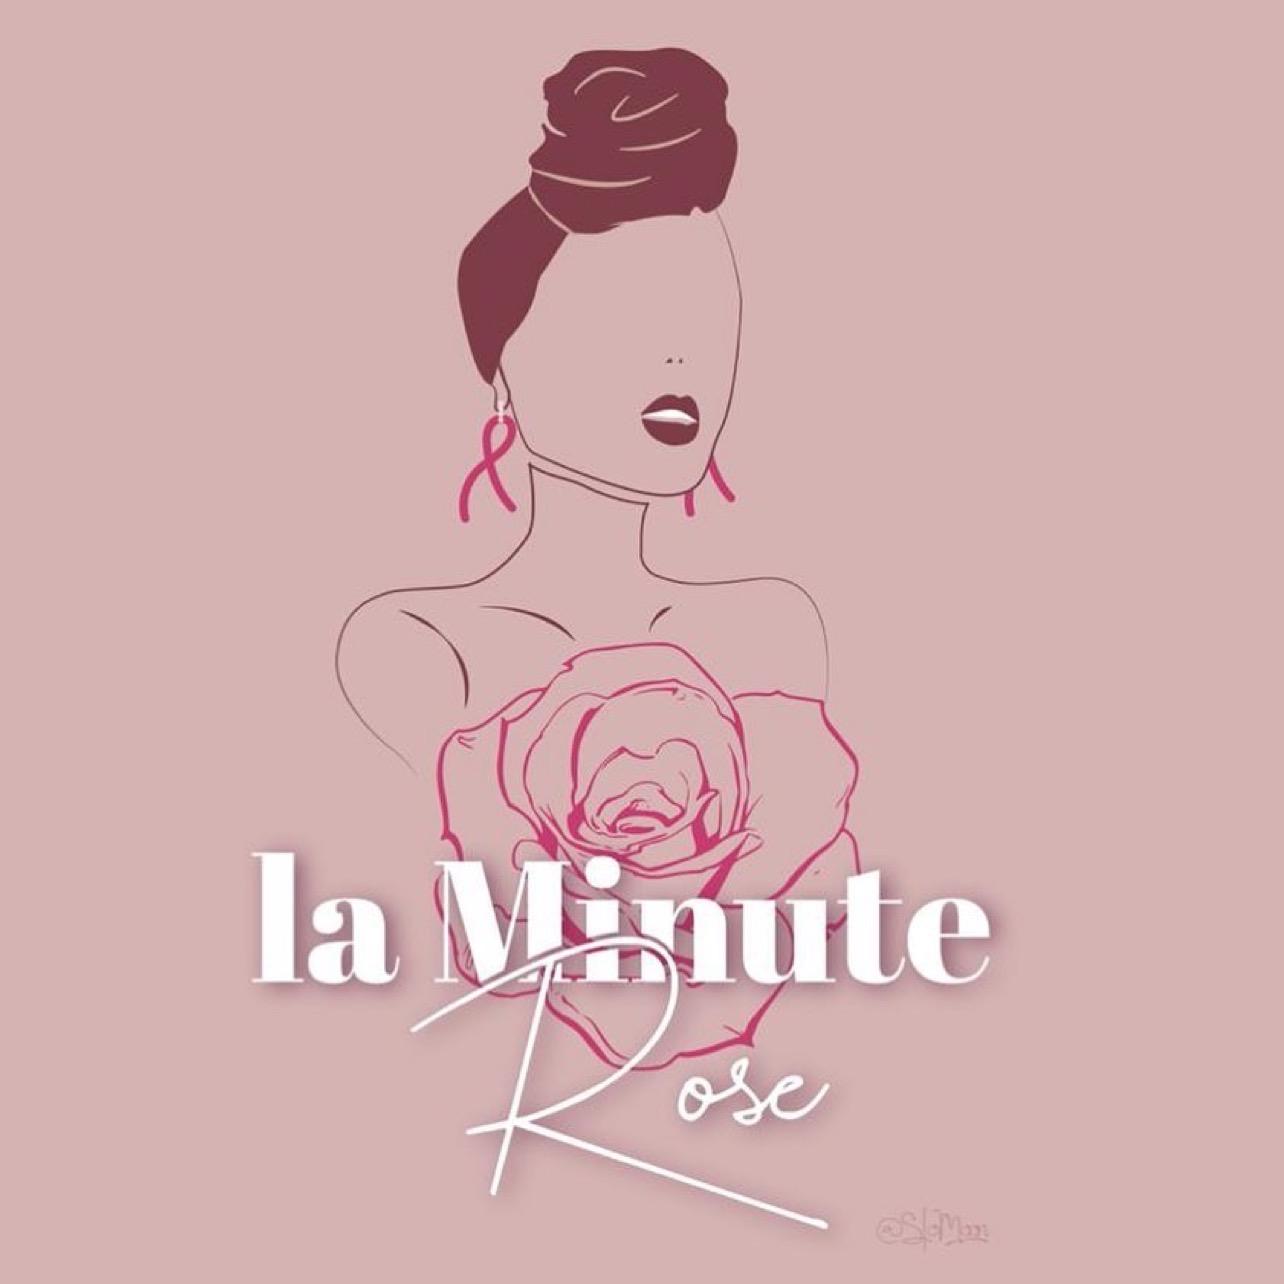 La minute Rose by Talina - Octobre Rose 2021